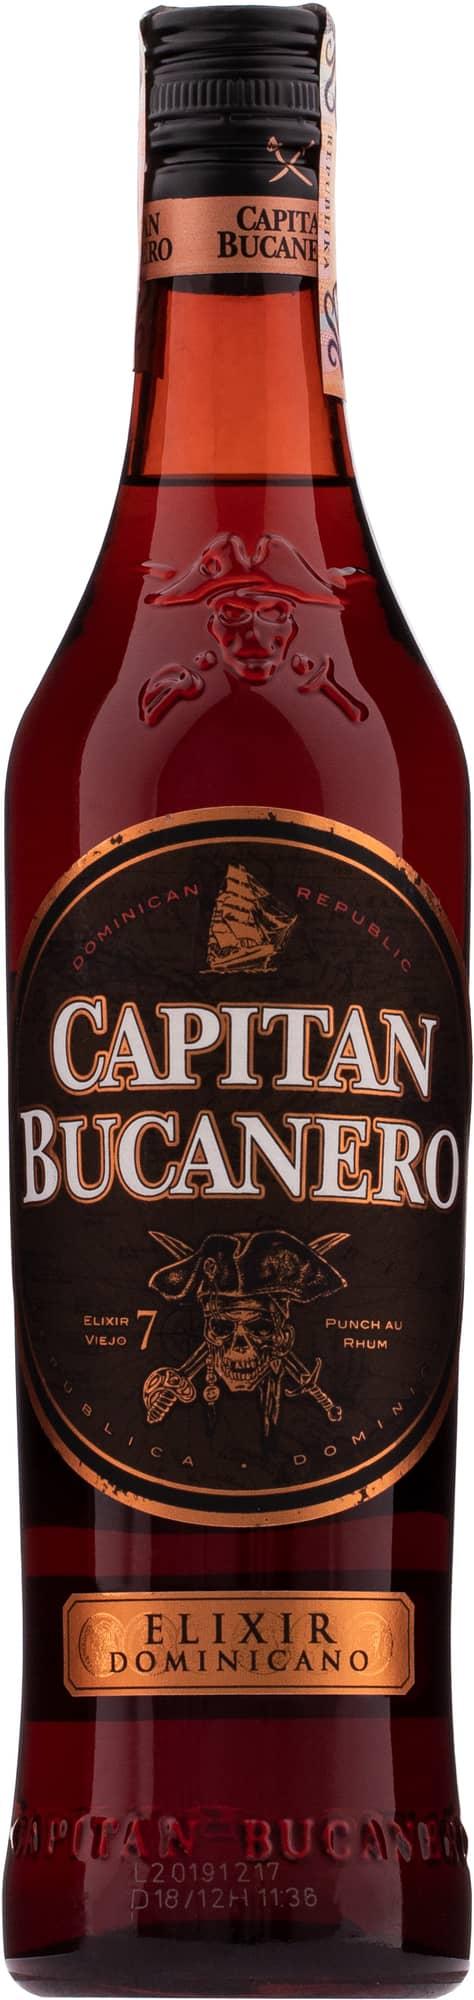 Capitan Bucanero 7y 34% 0,7l+ROZVOZ PRAHA ZDARMA